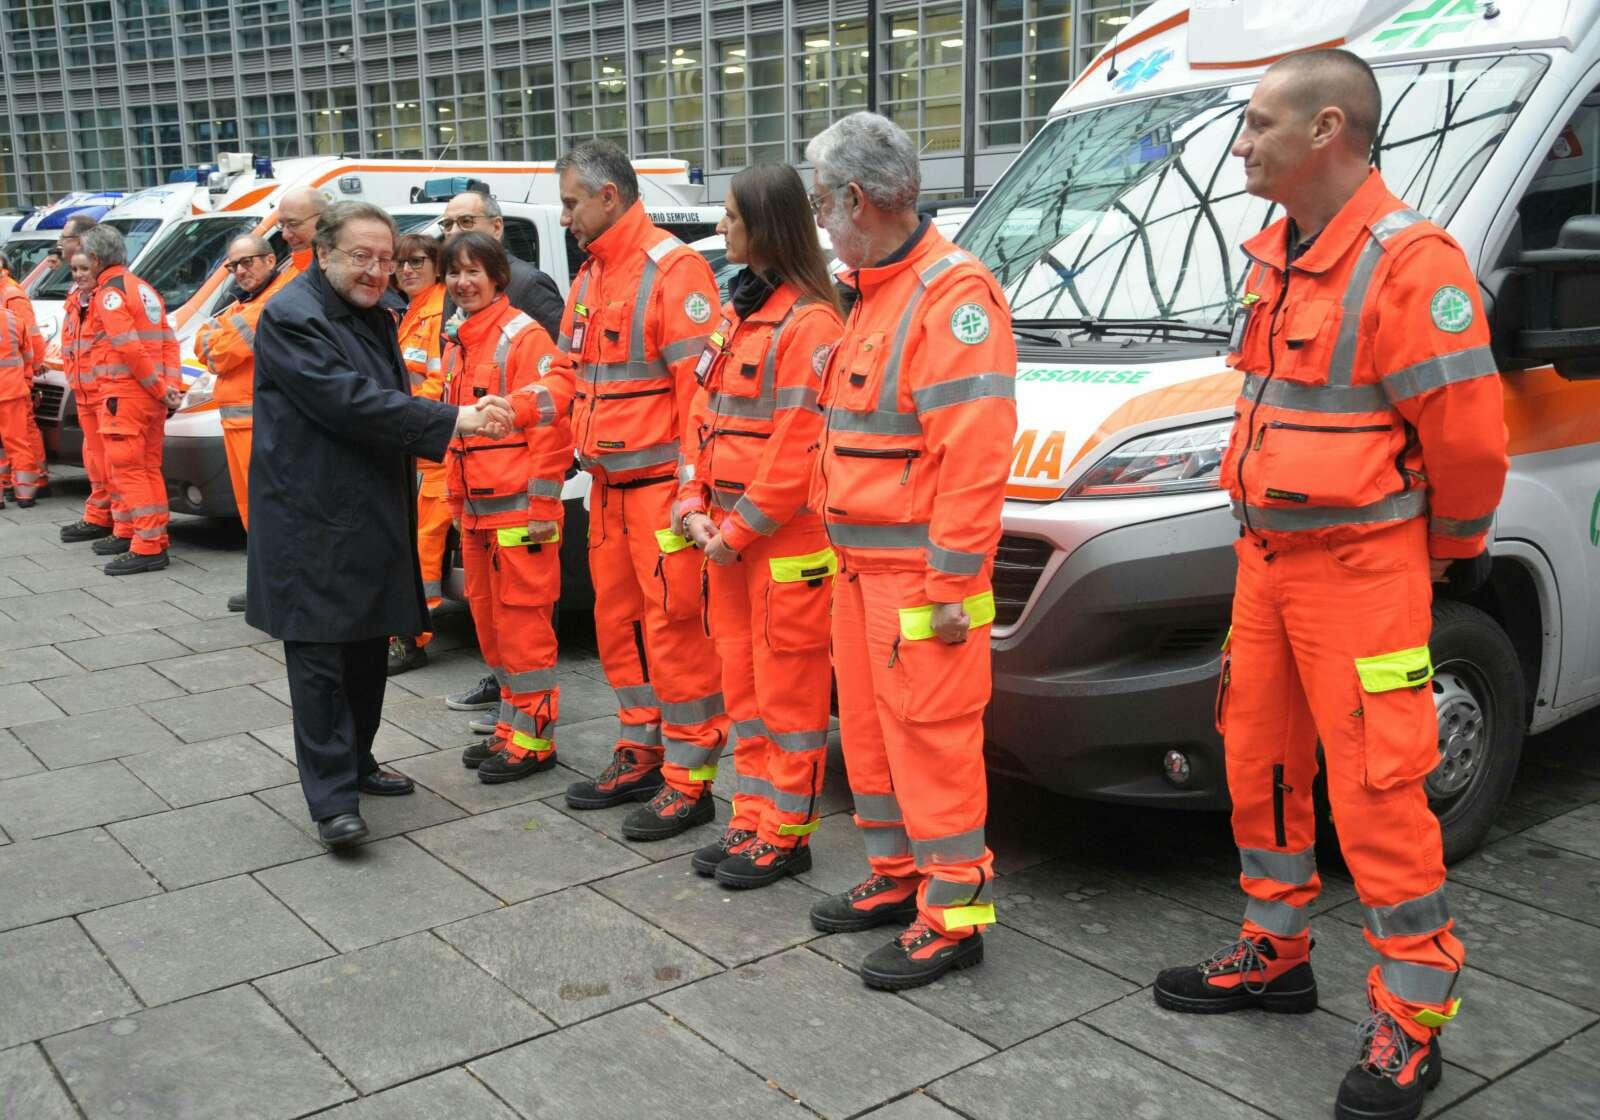 Giornata della sicurezza stradale premiate Madesimo e Sondrio - Valtellina News